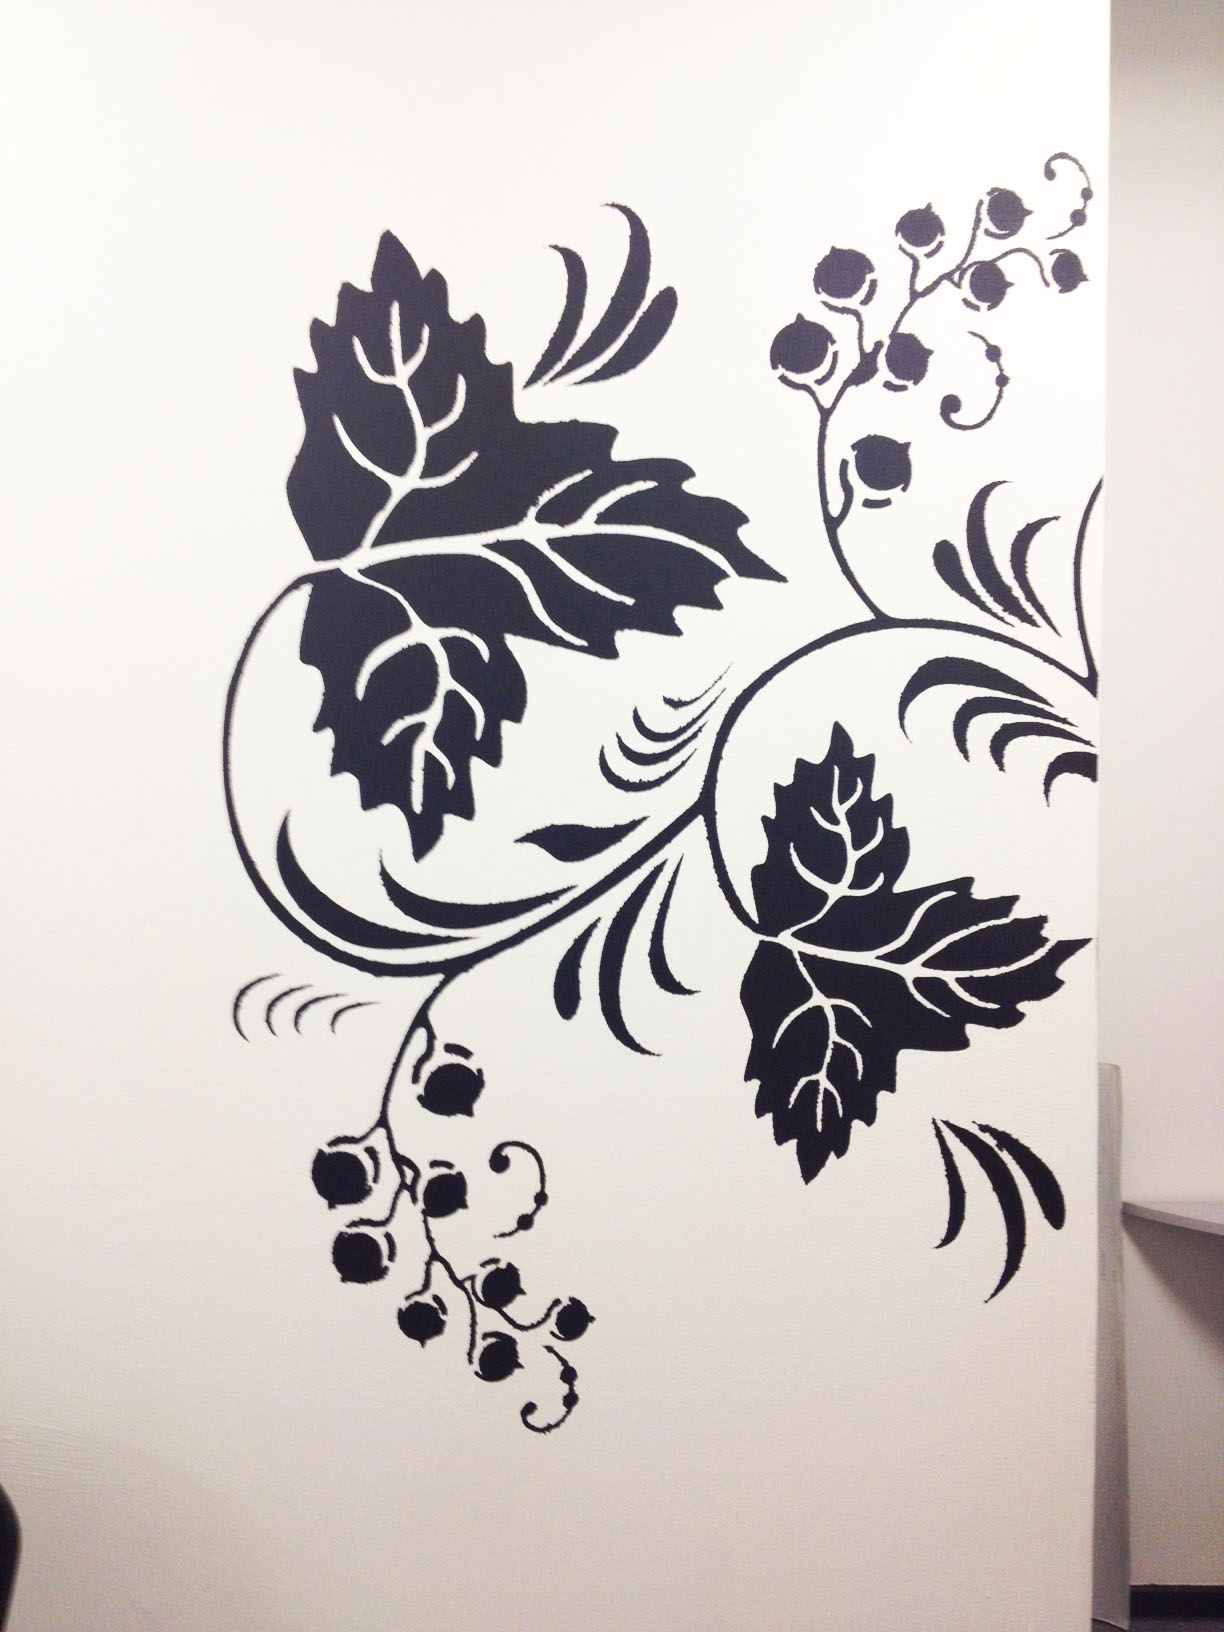 Трафареты для рисунки на стенах квартир своими руками 335